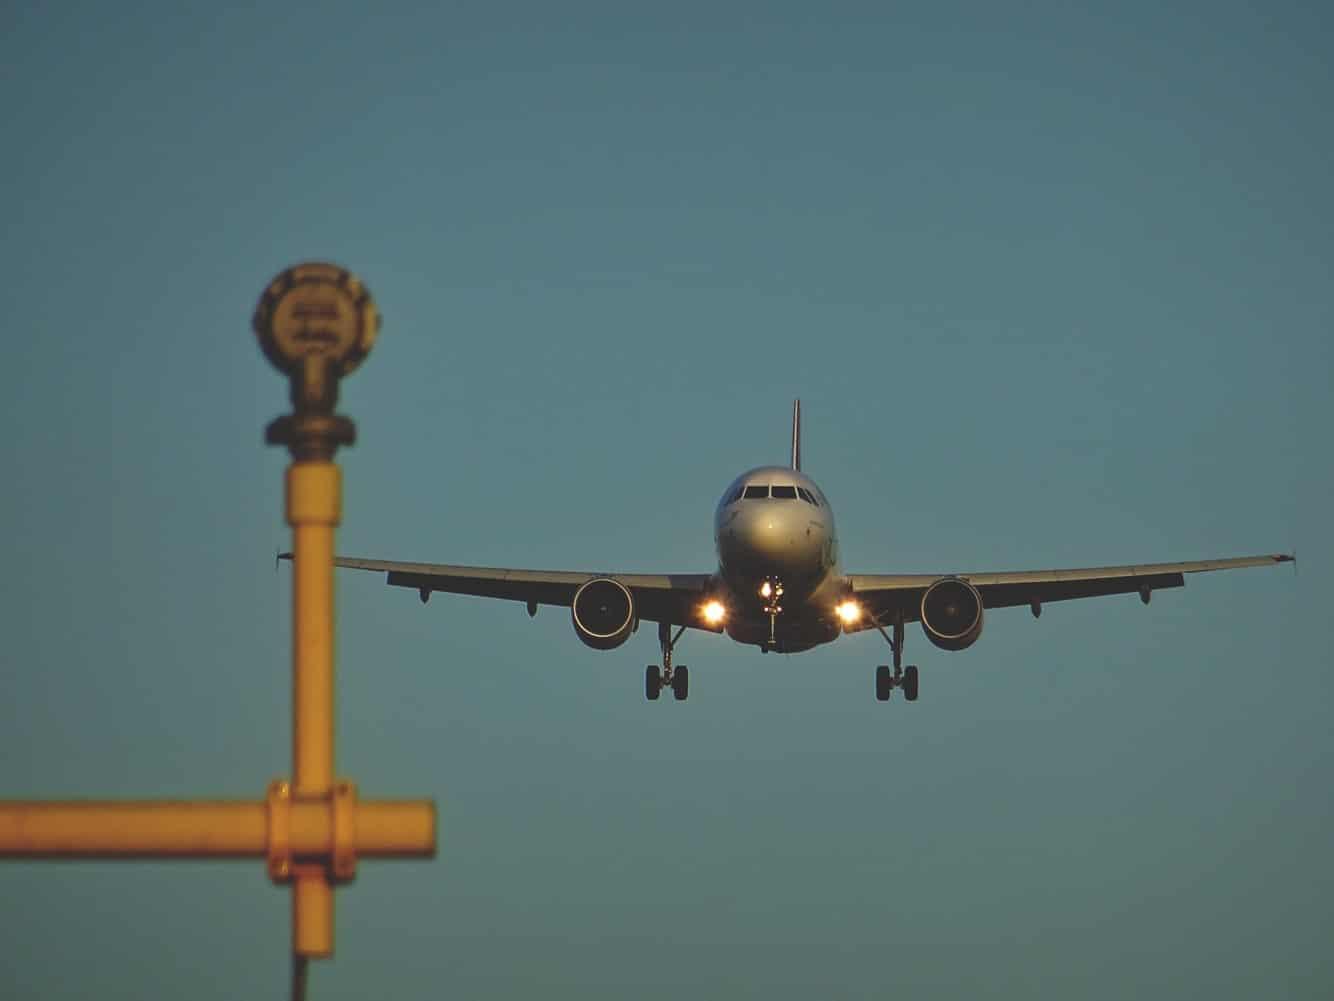 Airplane Turkish Airlines